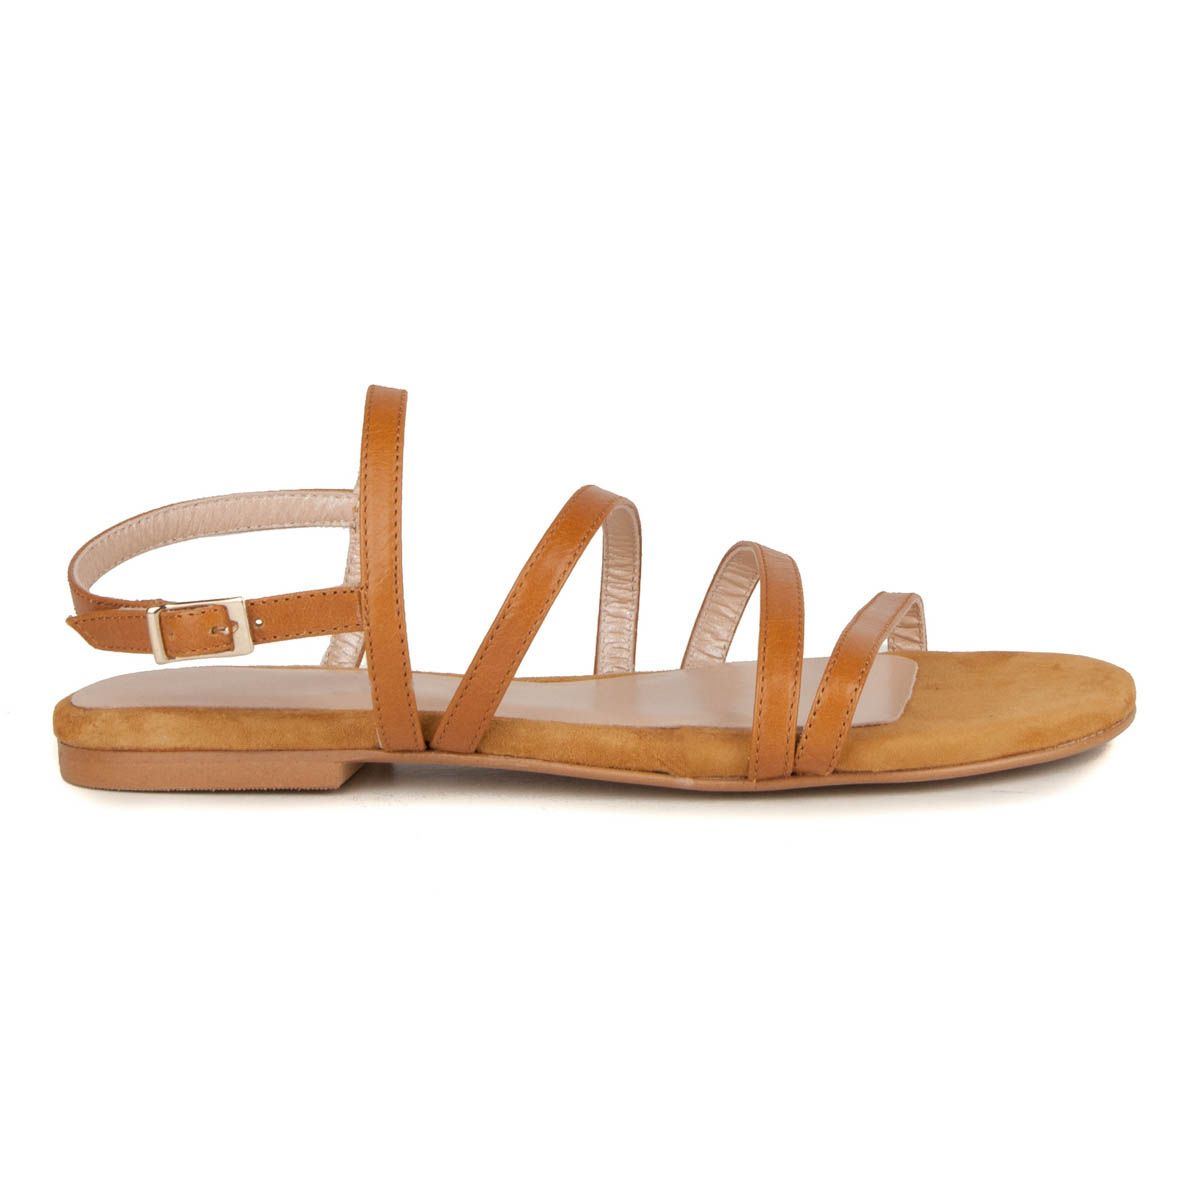 Montevita Flat Gladiator Sandal in Camel